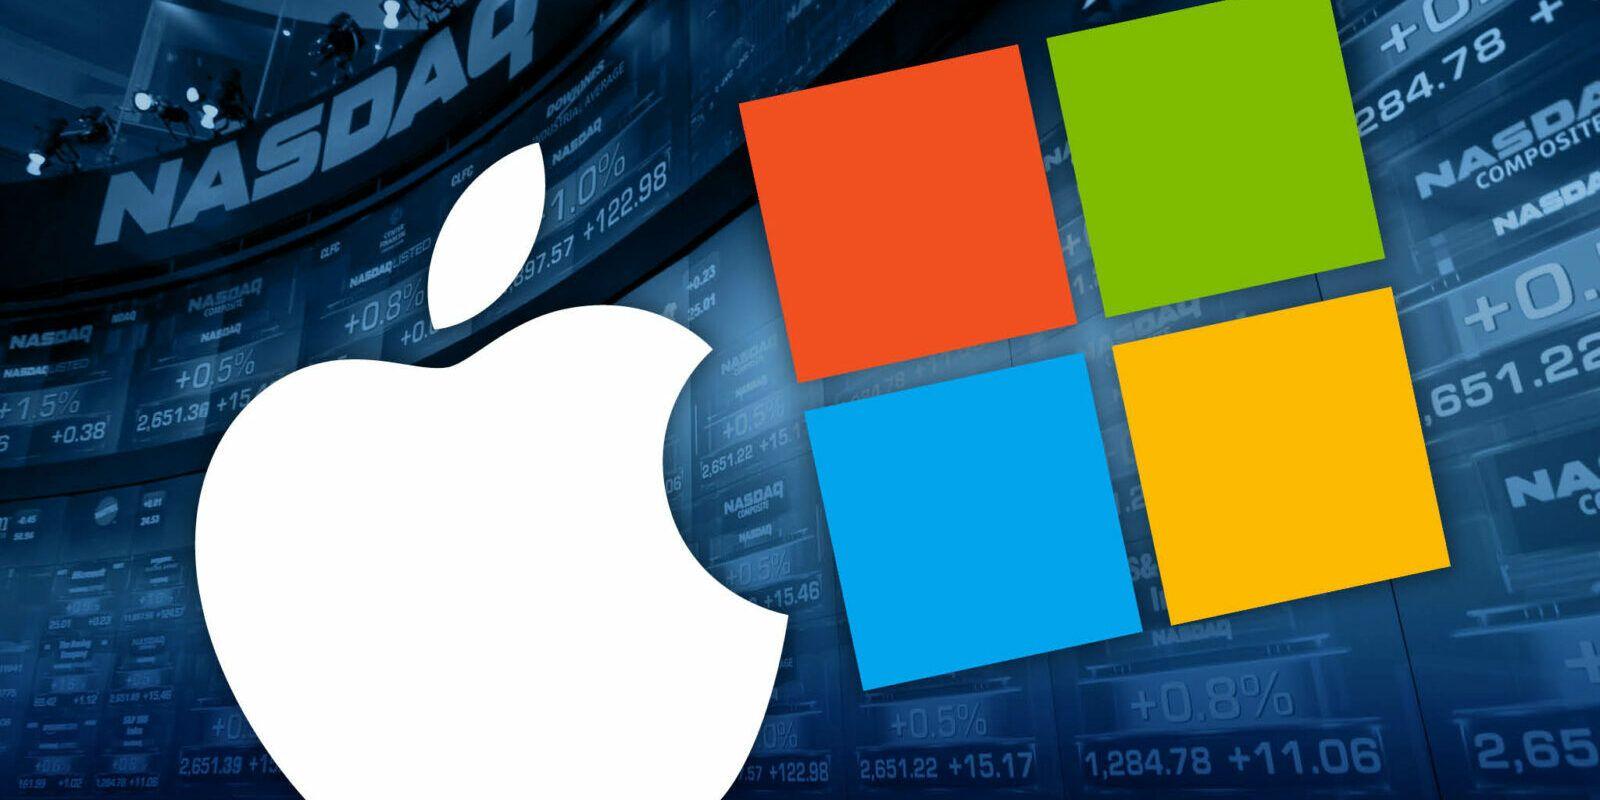 Как Microsoft и Amazon борются за рынок облачных технологий- Kapital.kz